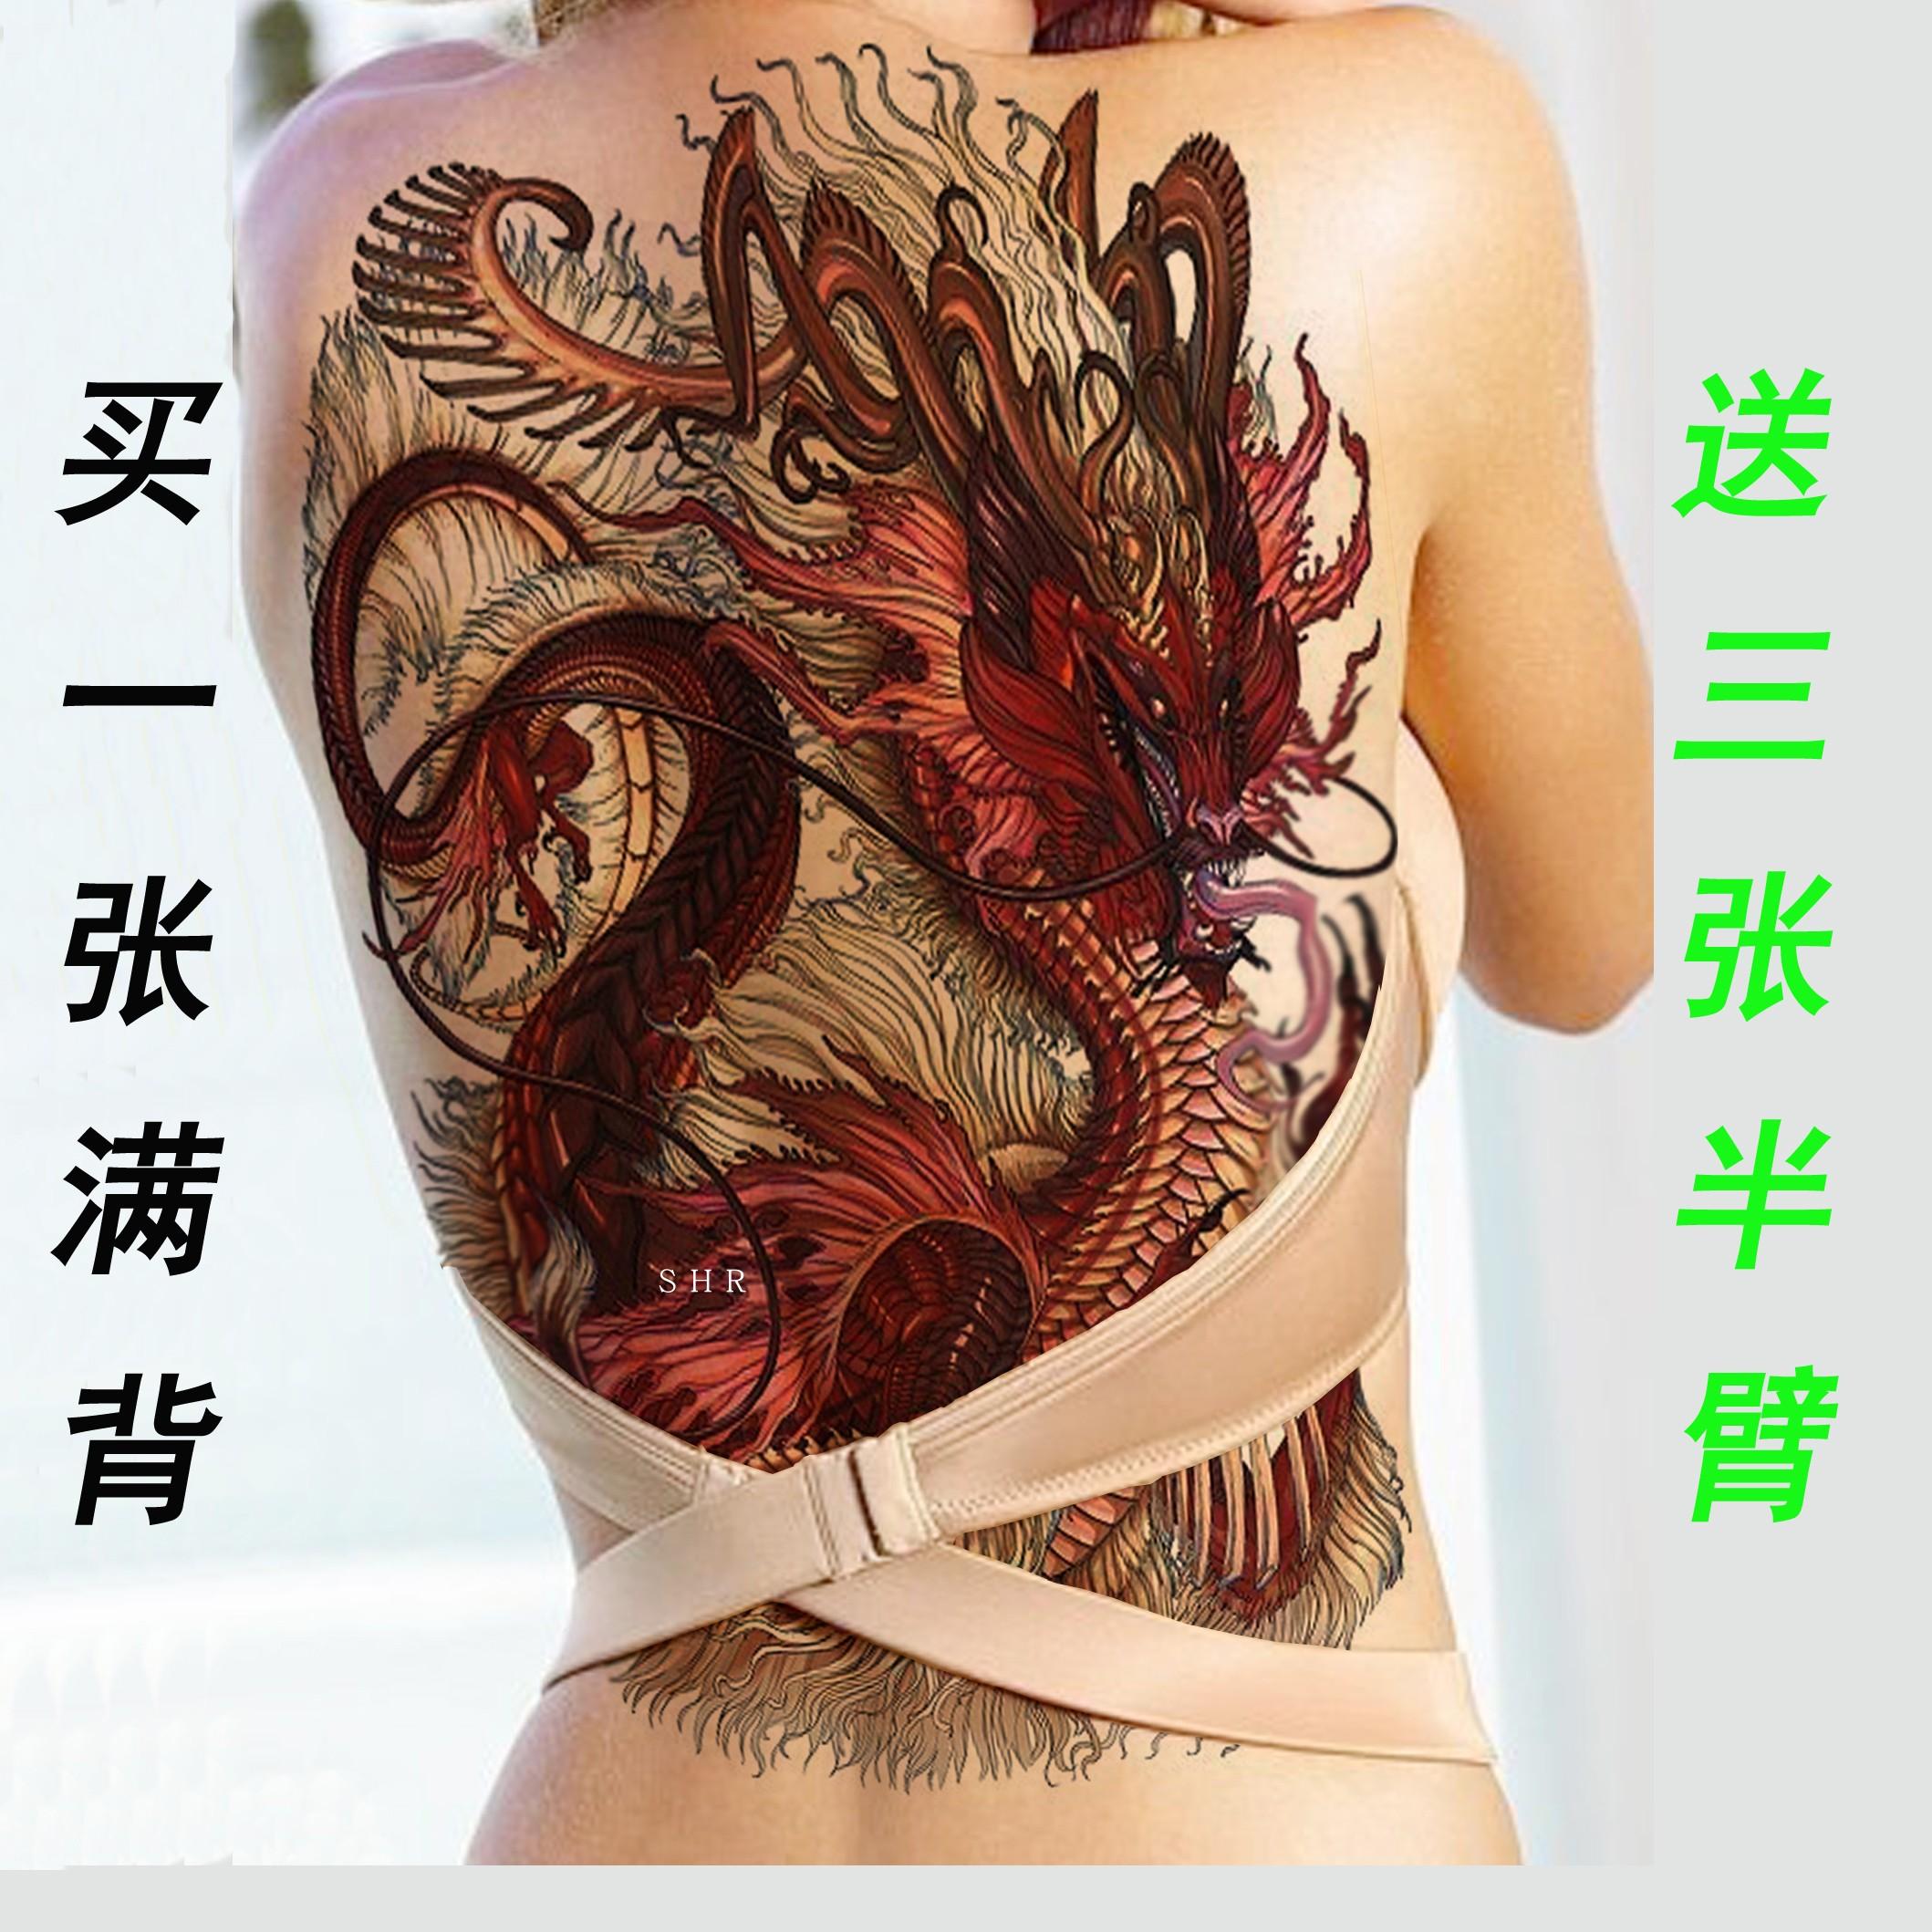 Full Back Tattoo Stickers Simulation Chinese Dragon